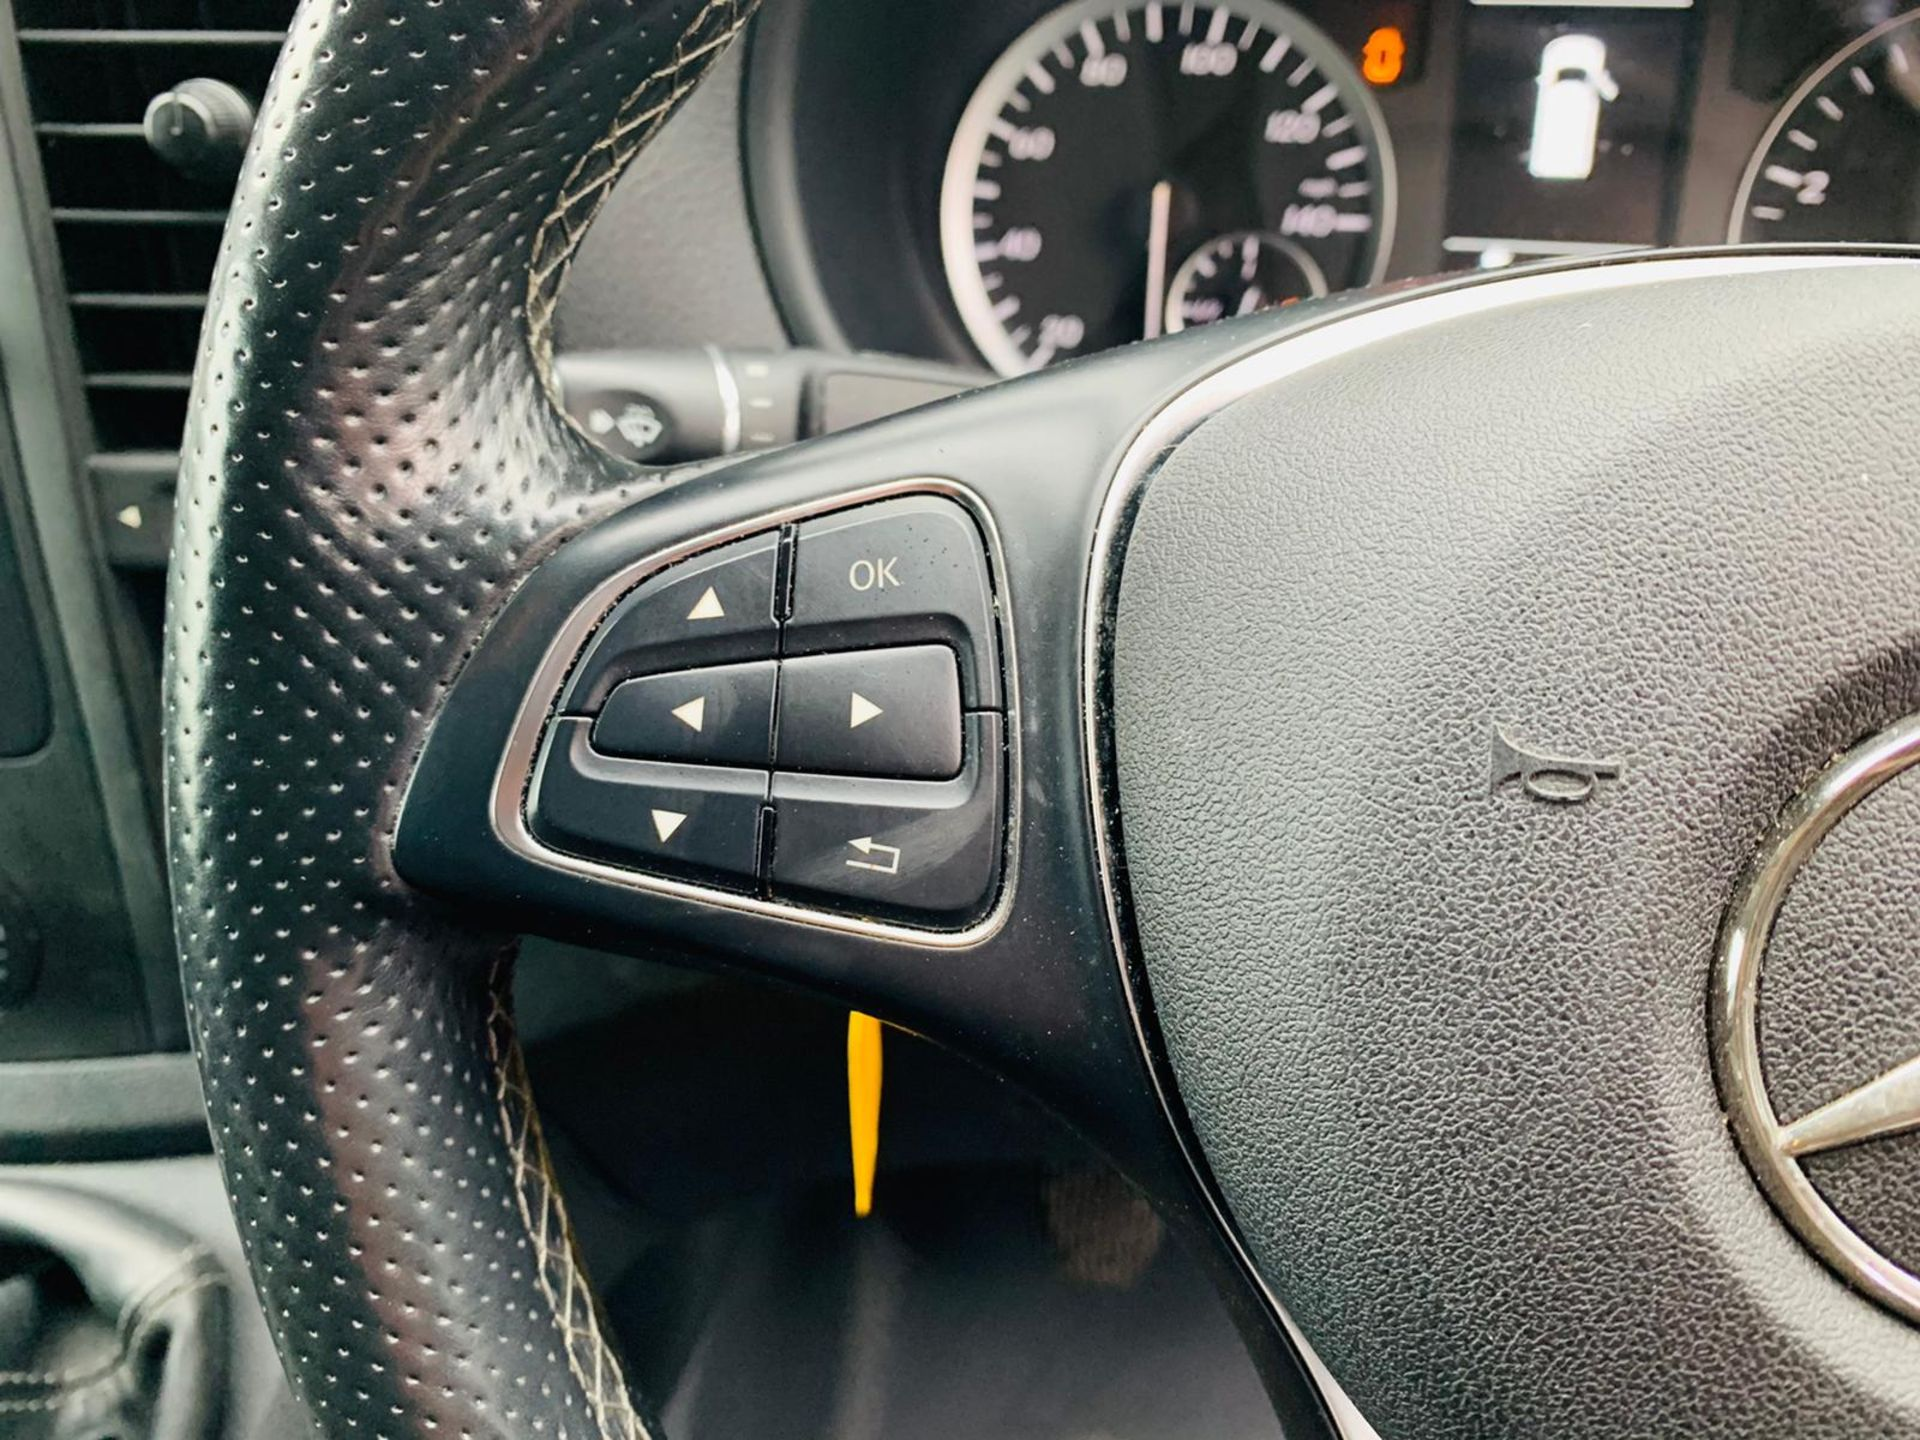 (RESERVE MET) Mercedes Vito 116Cdi Sporty Spec (161 BHP) Bluetech 6 Speed Van - 2016 Model - AC - Image 25 of 28